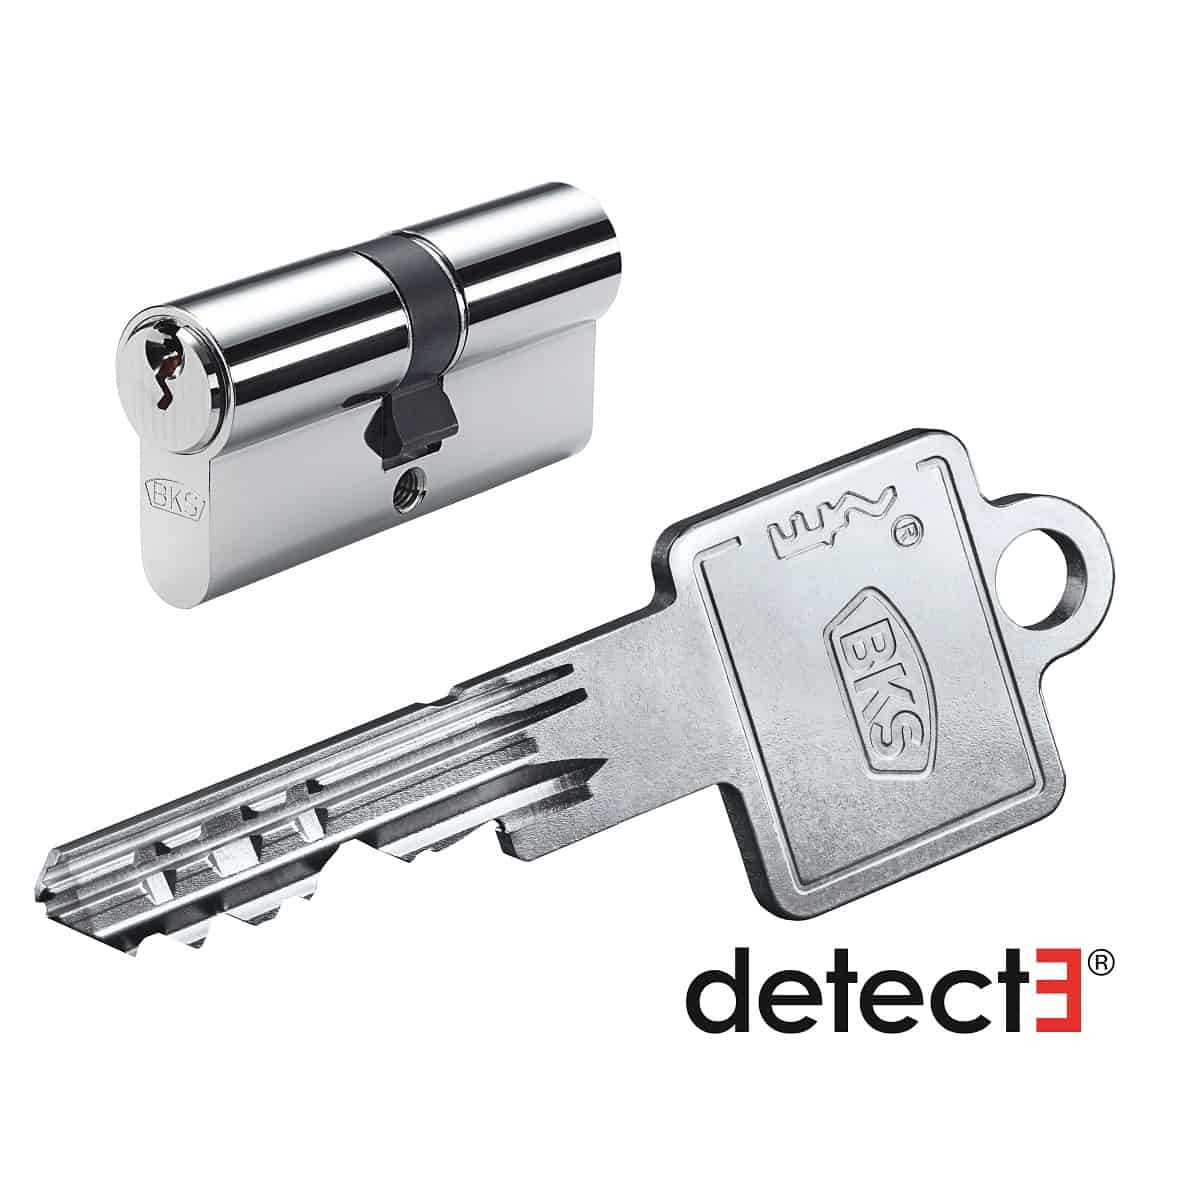 Schließsystem detect3_CMYK_300dpi